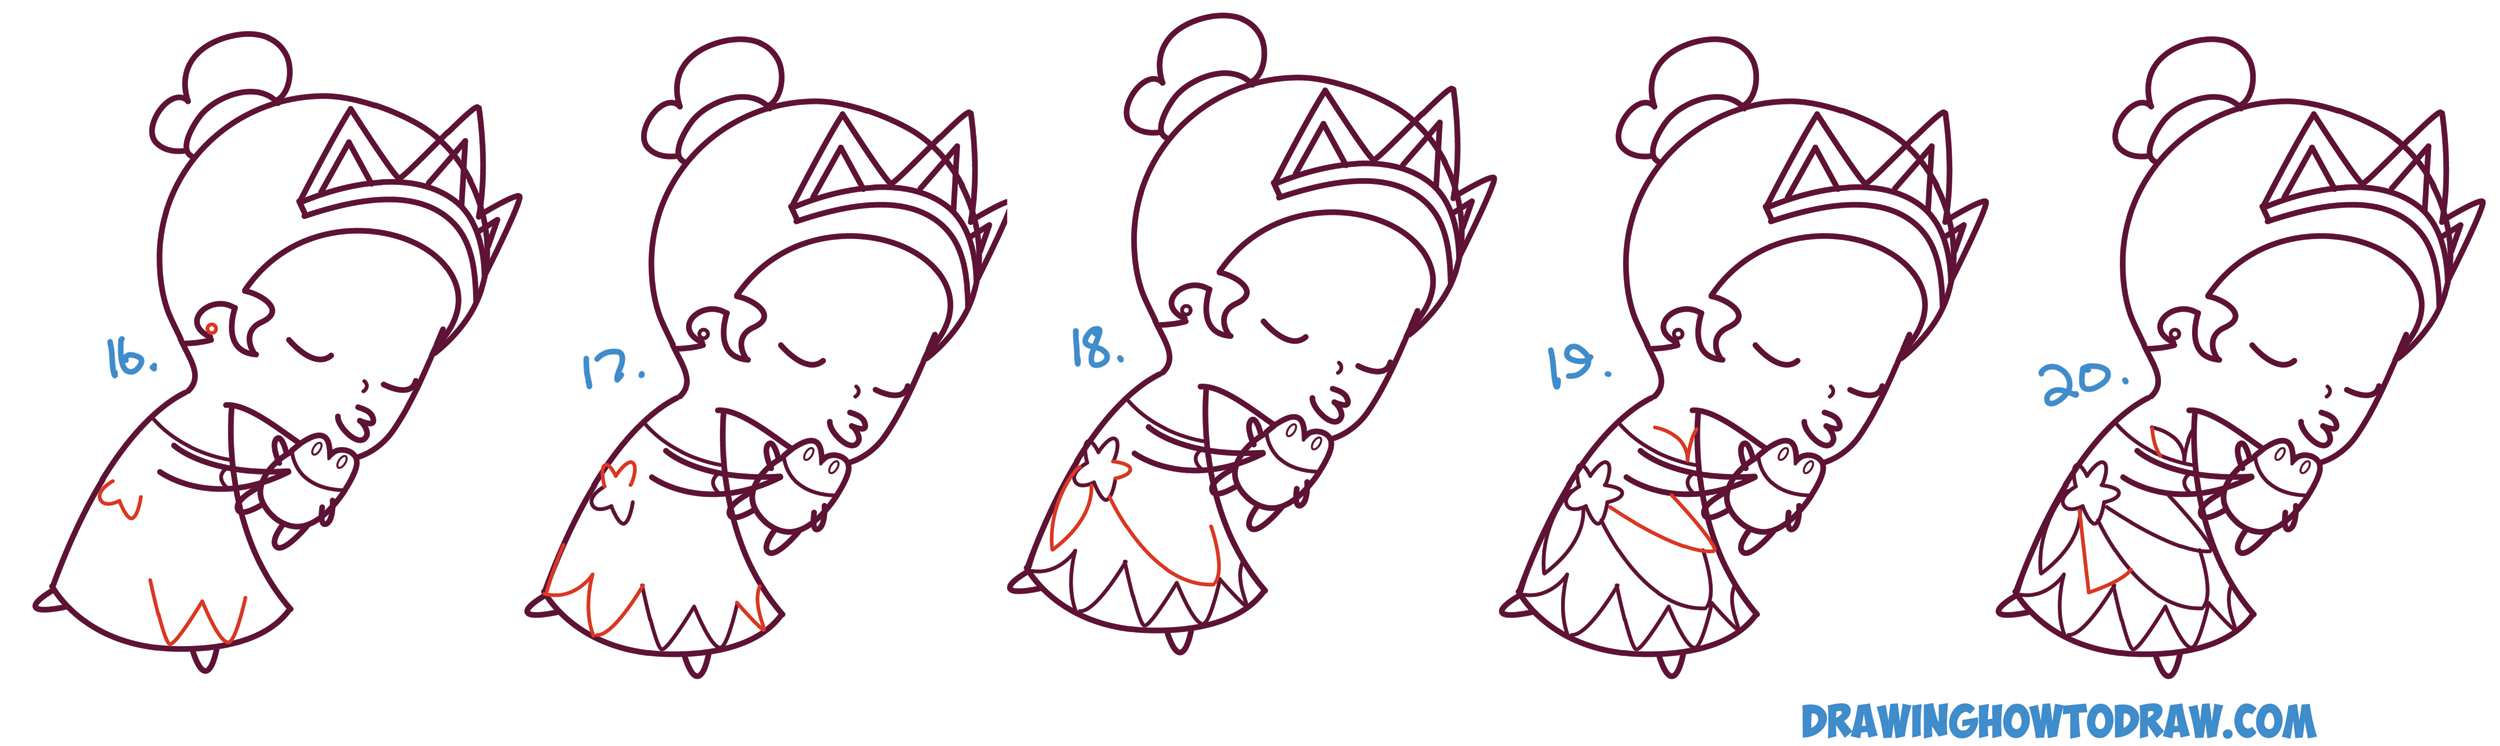 How to Draw Princess Tiana Kissing a Frog (Cute / Chibi ...